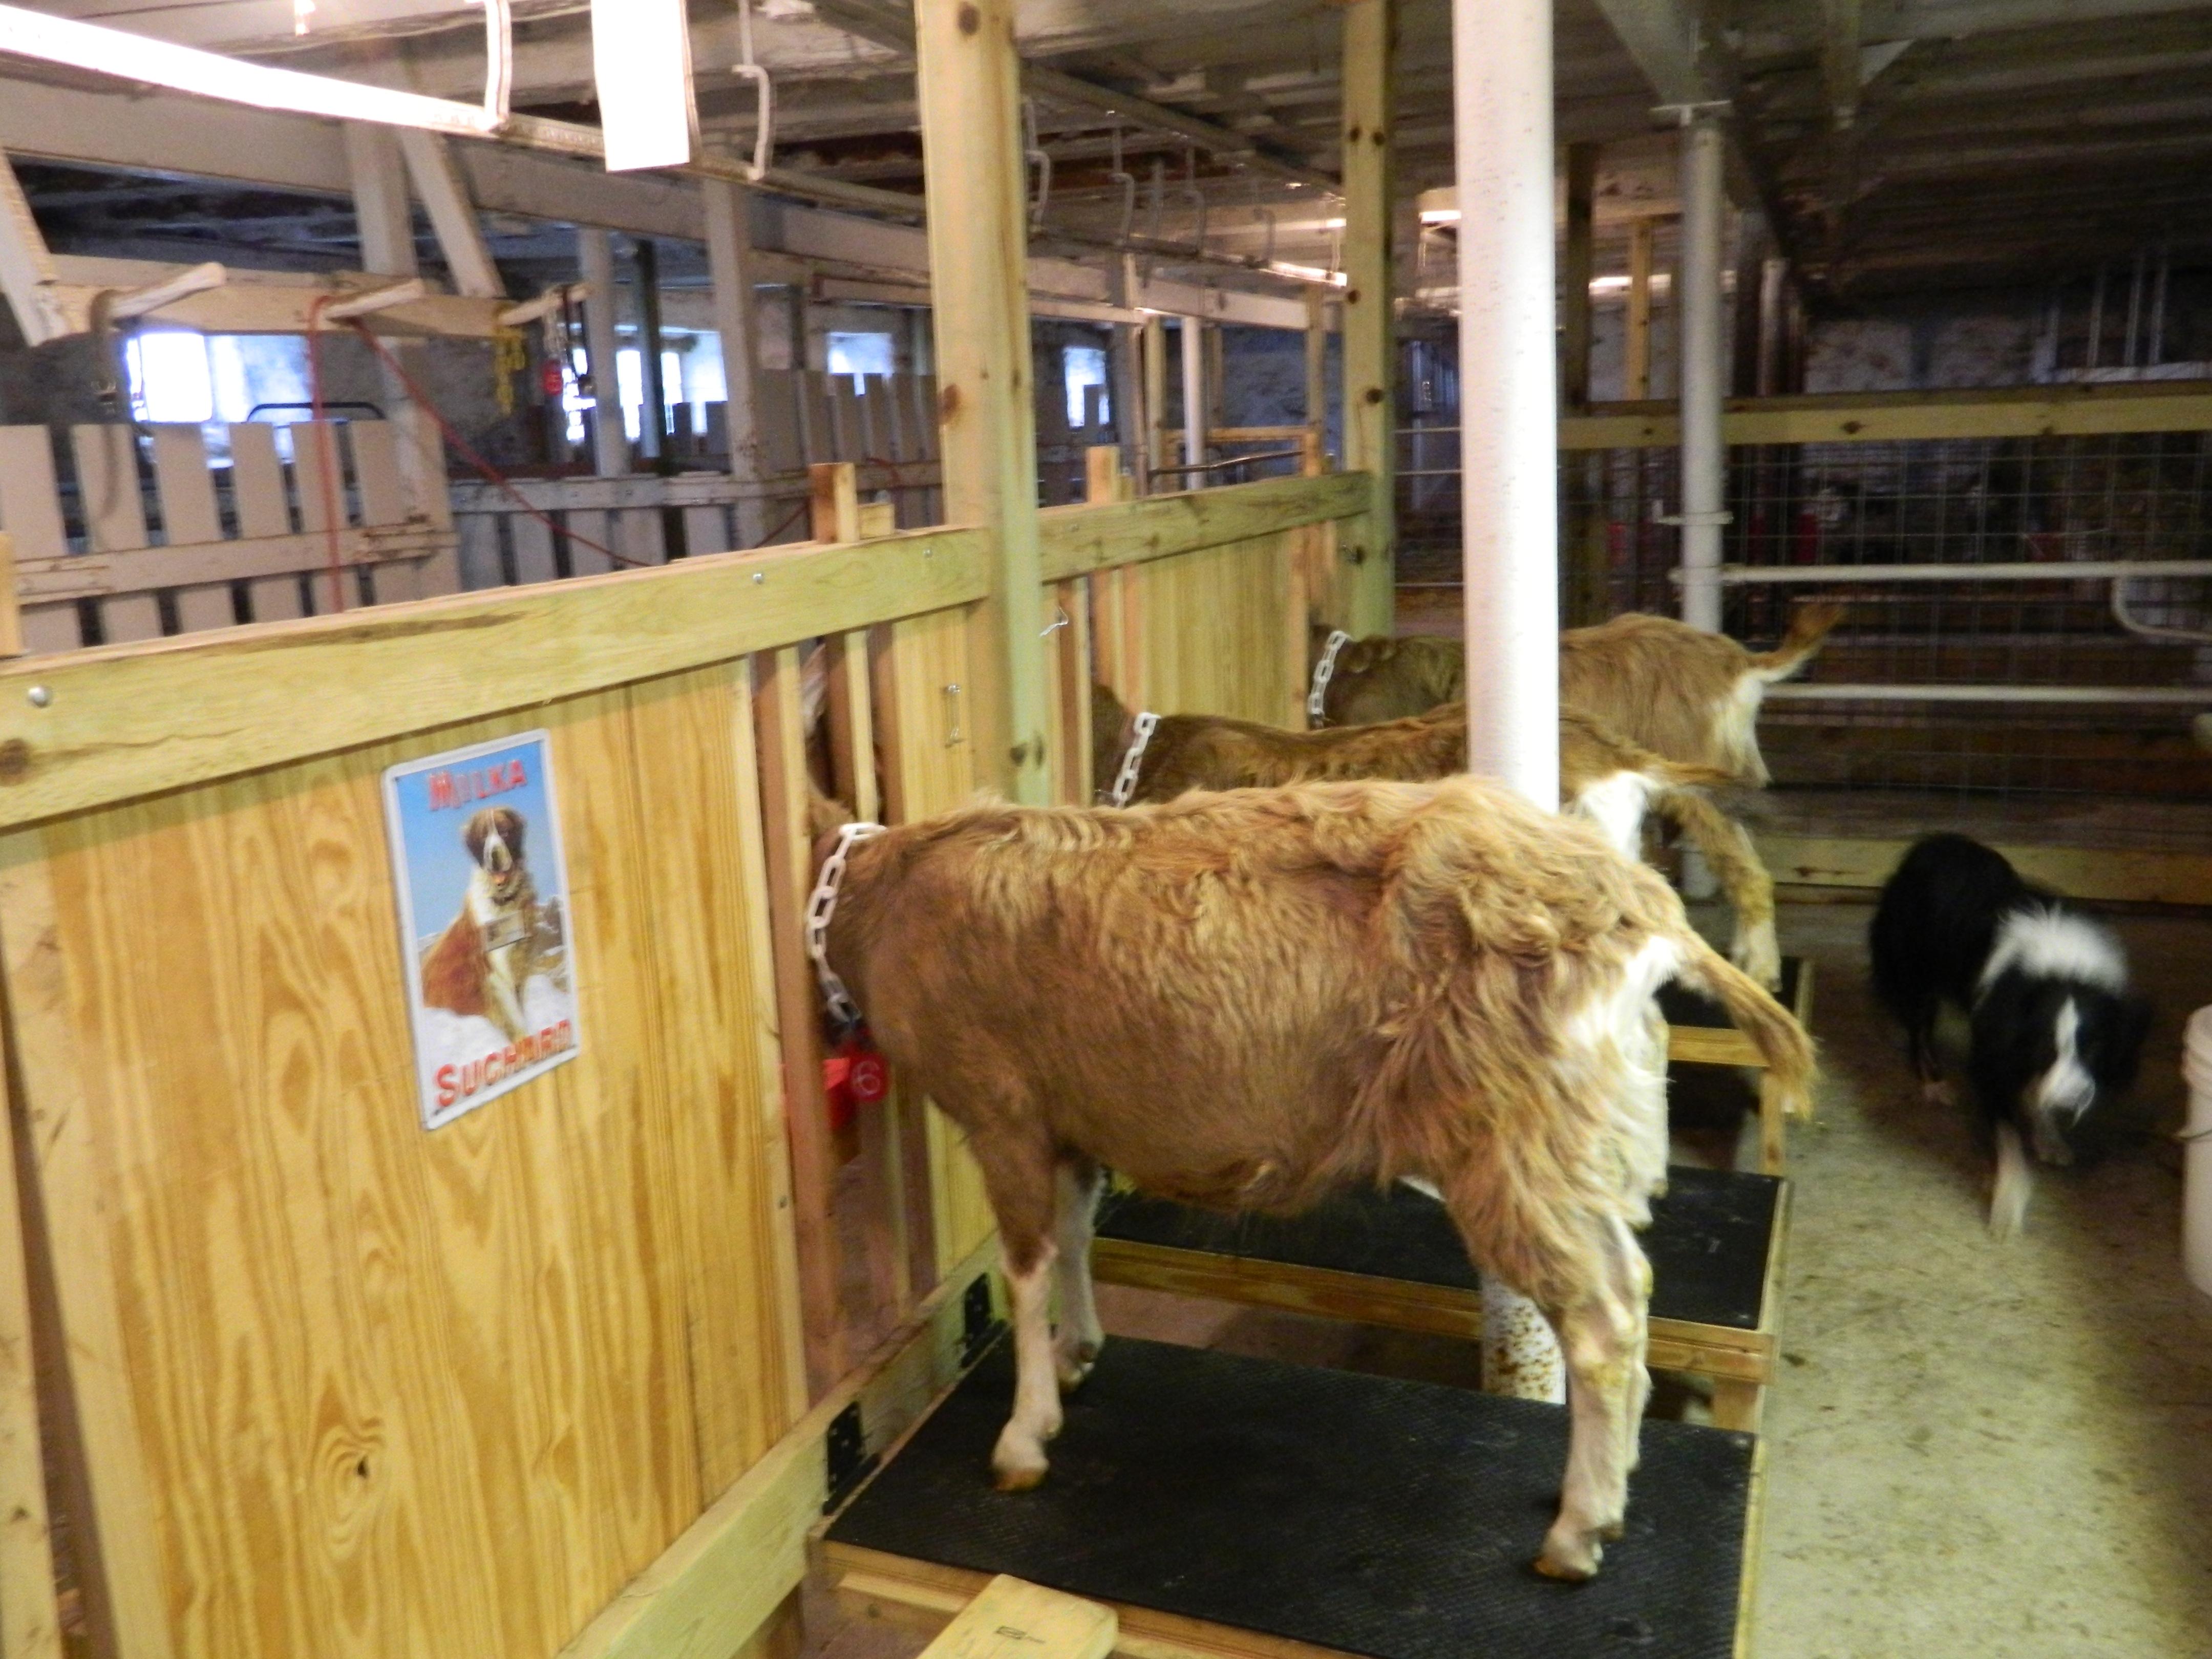 Swiss Frau Farm Products Goat S Milk Soaps Lotions